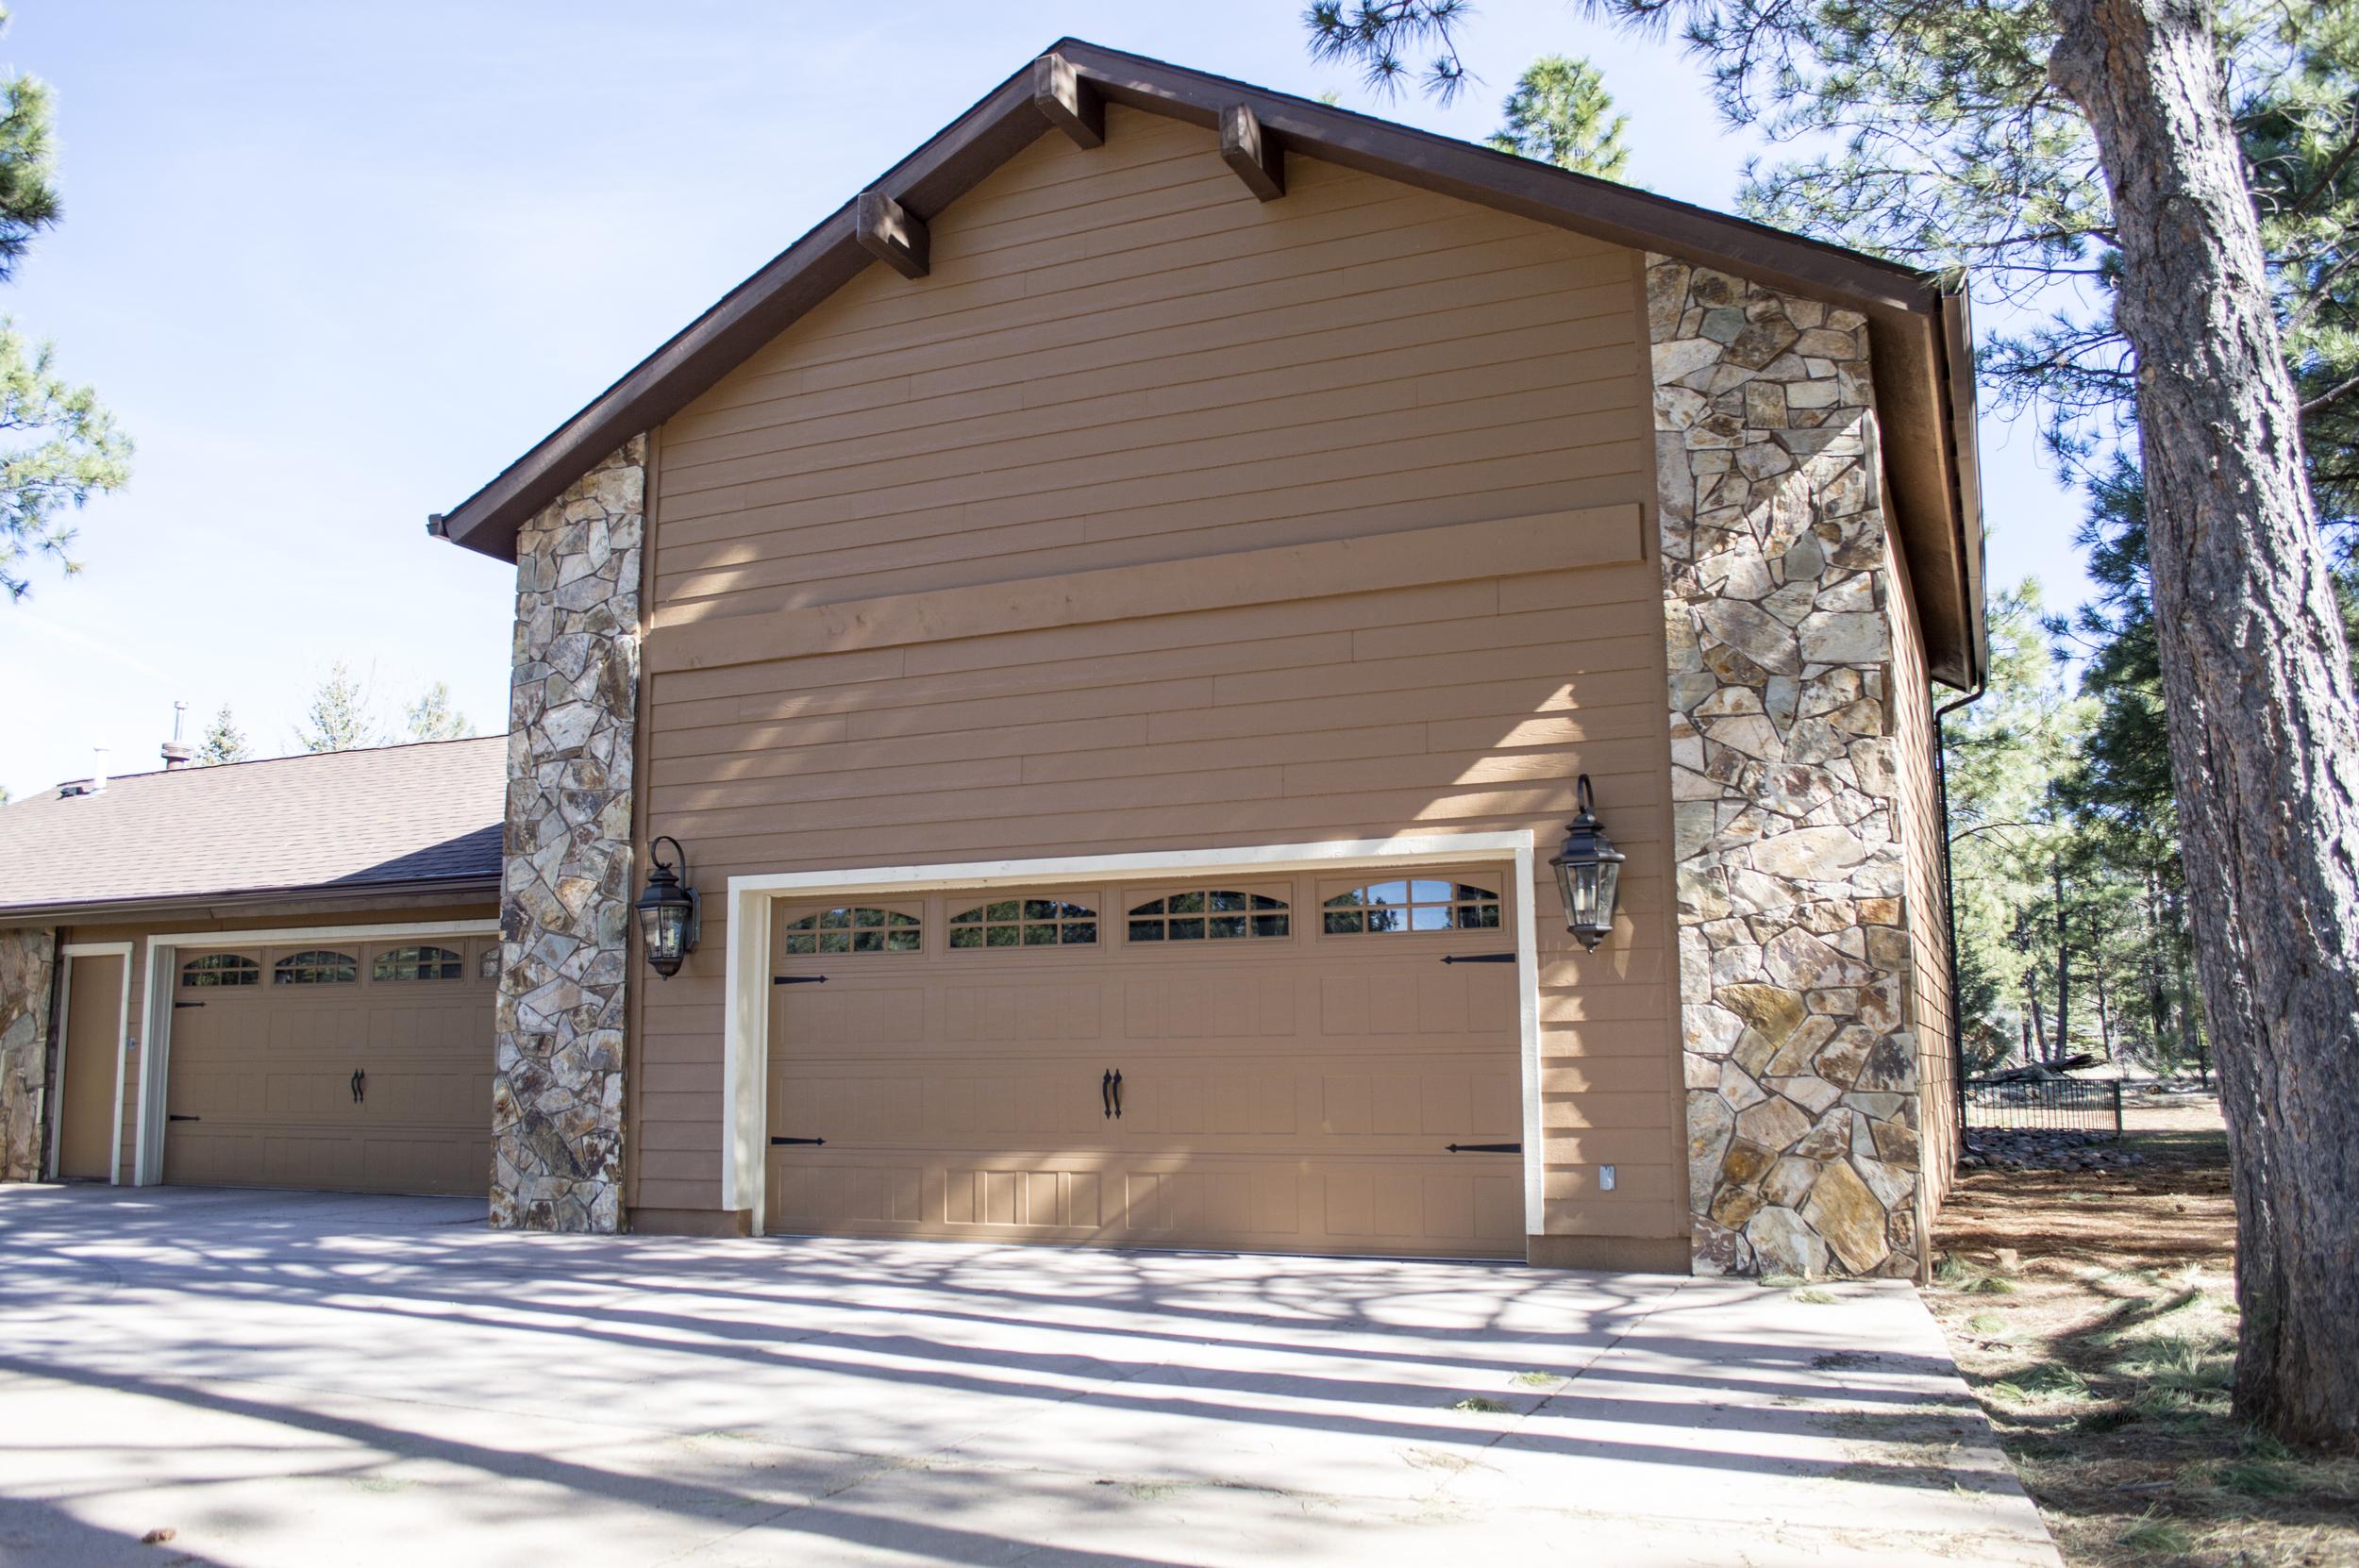 Exterior of a residential home near Flagstaff, Arizona.